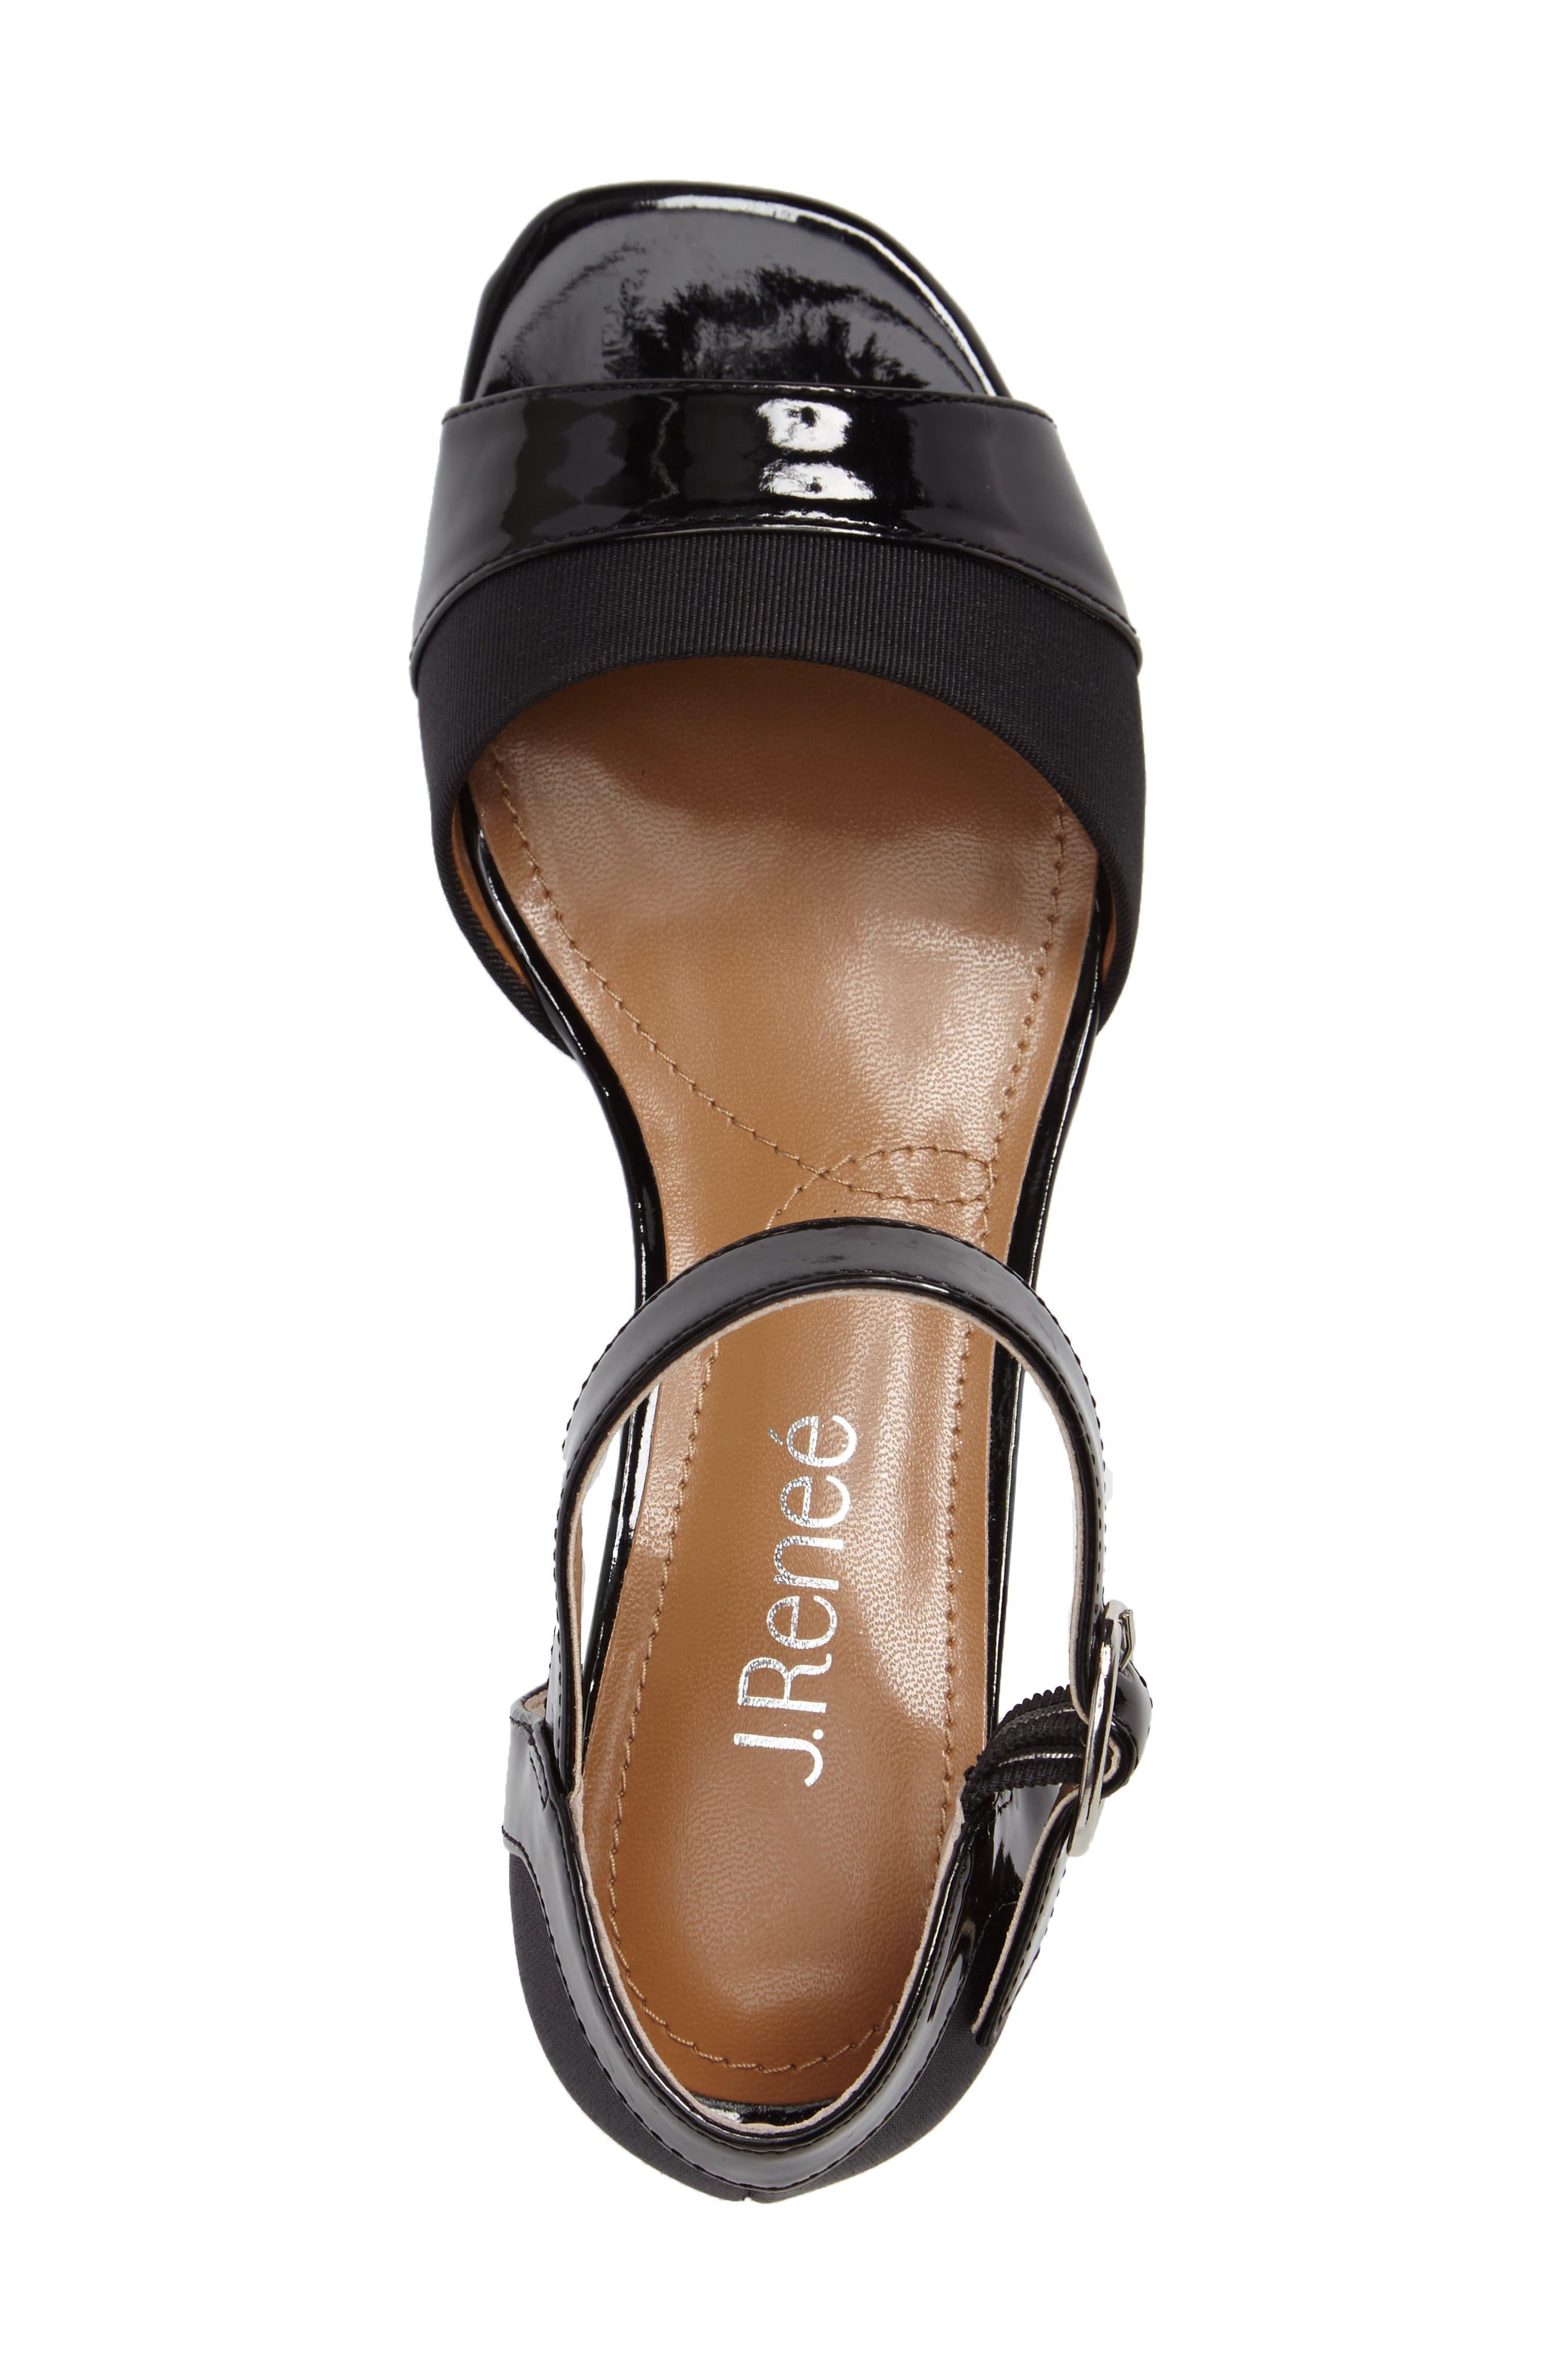 Pebblebeach Block Heel Sandal,                             Alternate thumbnail 3, color,                             001